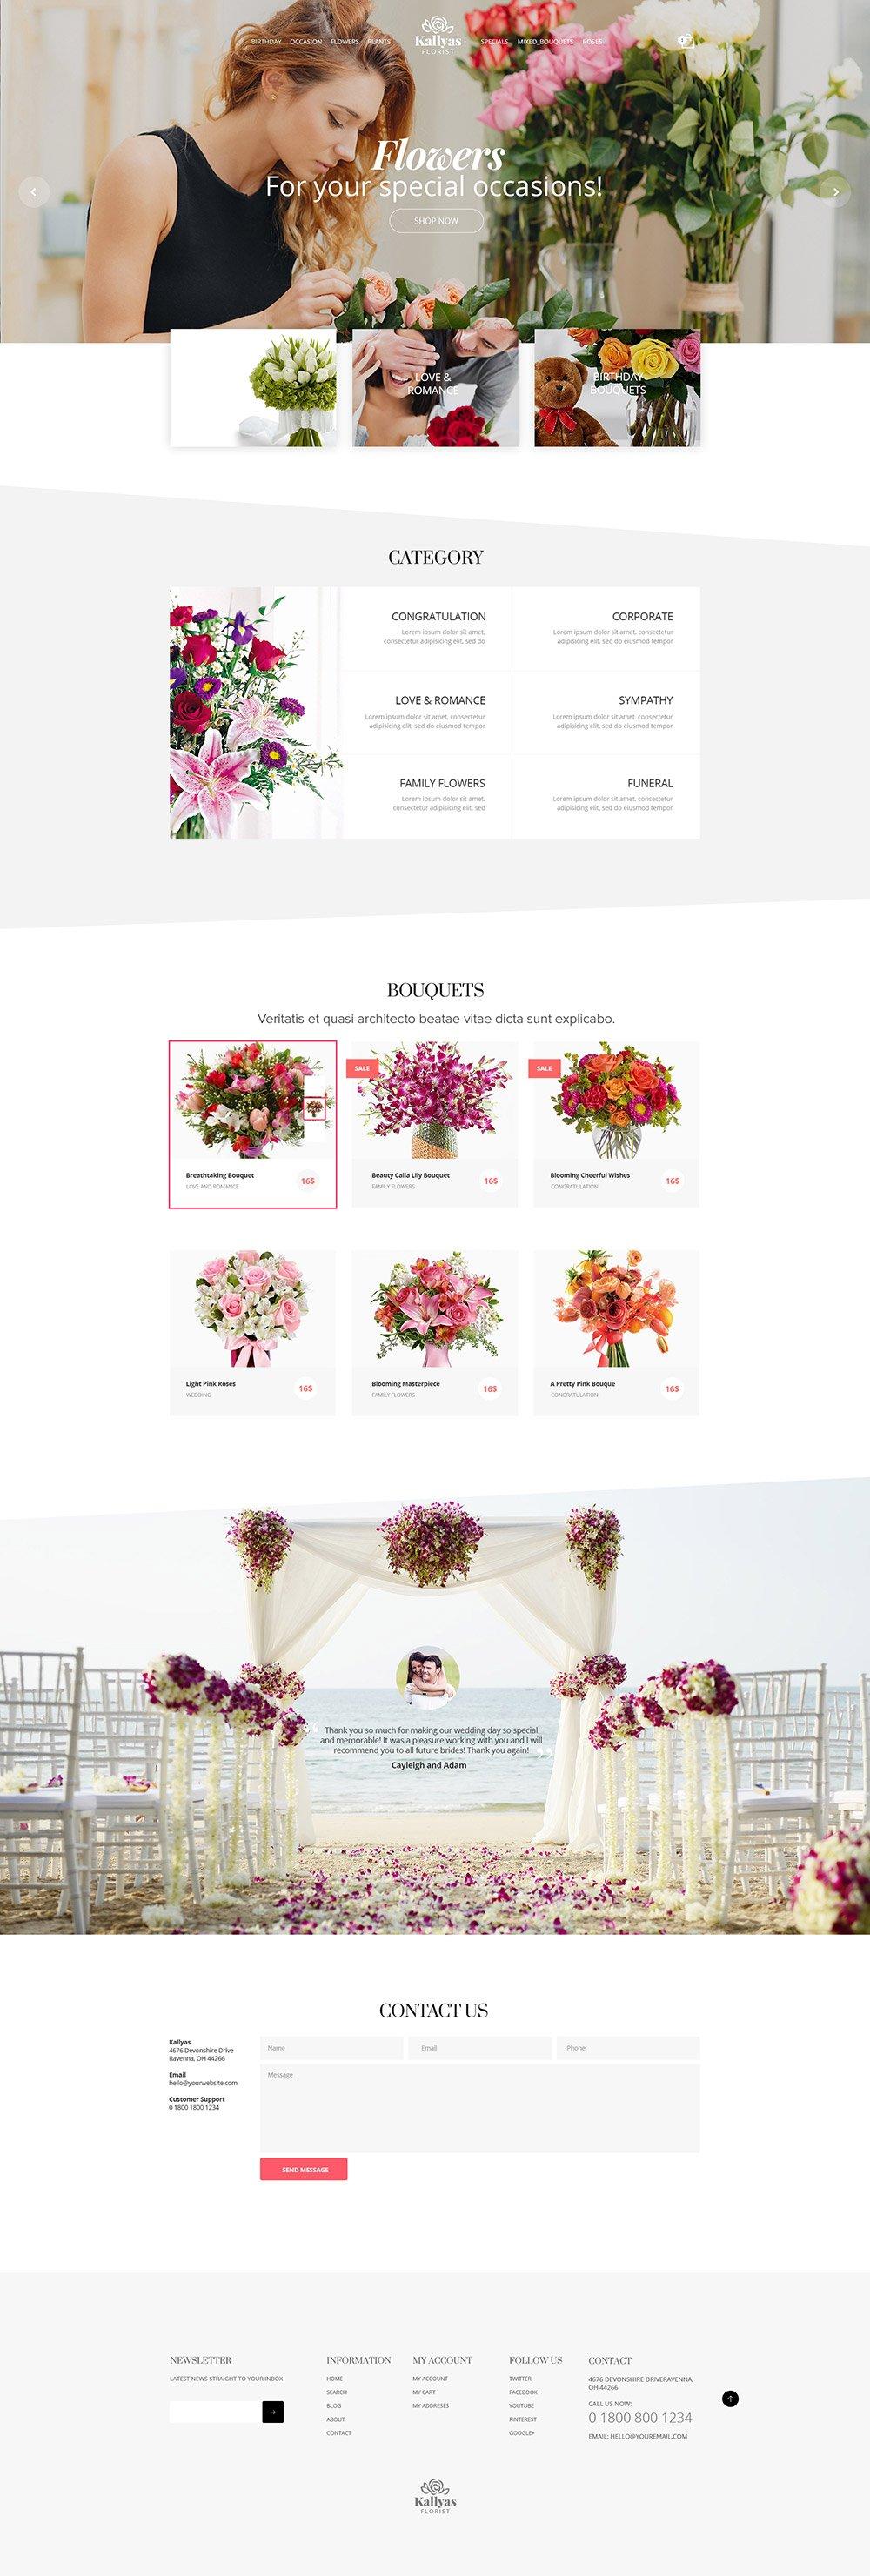 Florist Shop - Free PSD Template